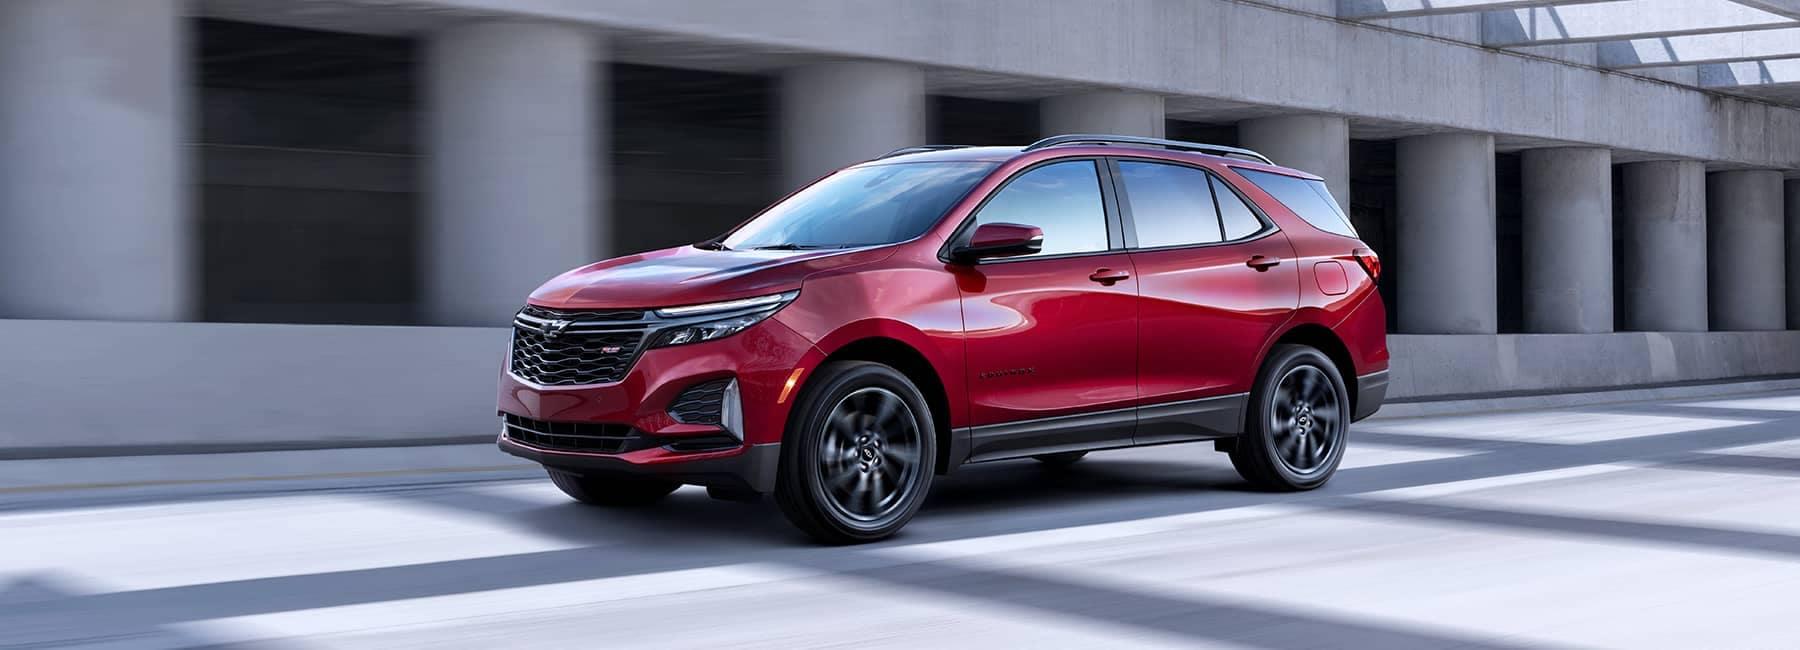 Red 2021 Chevrolet Equinox